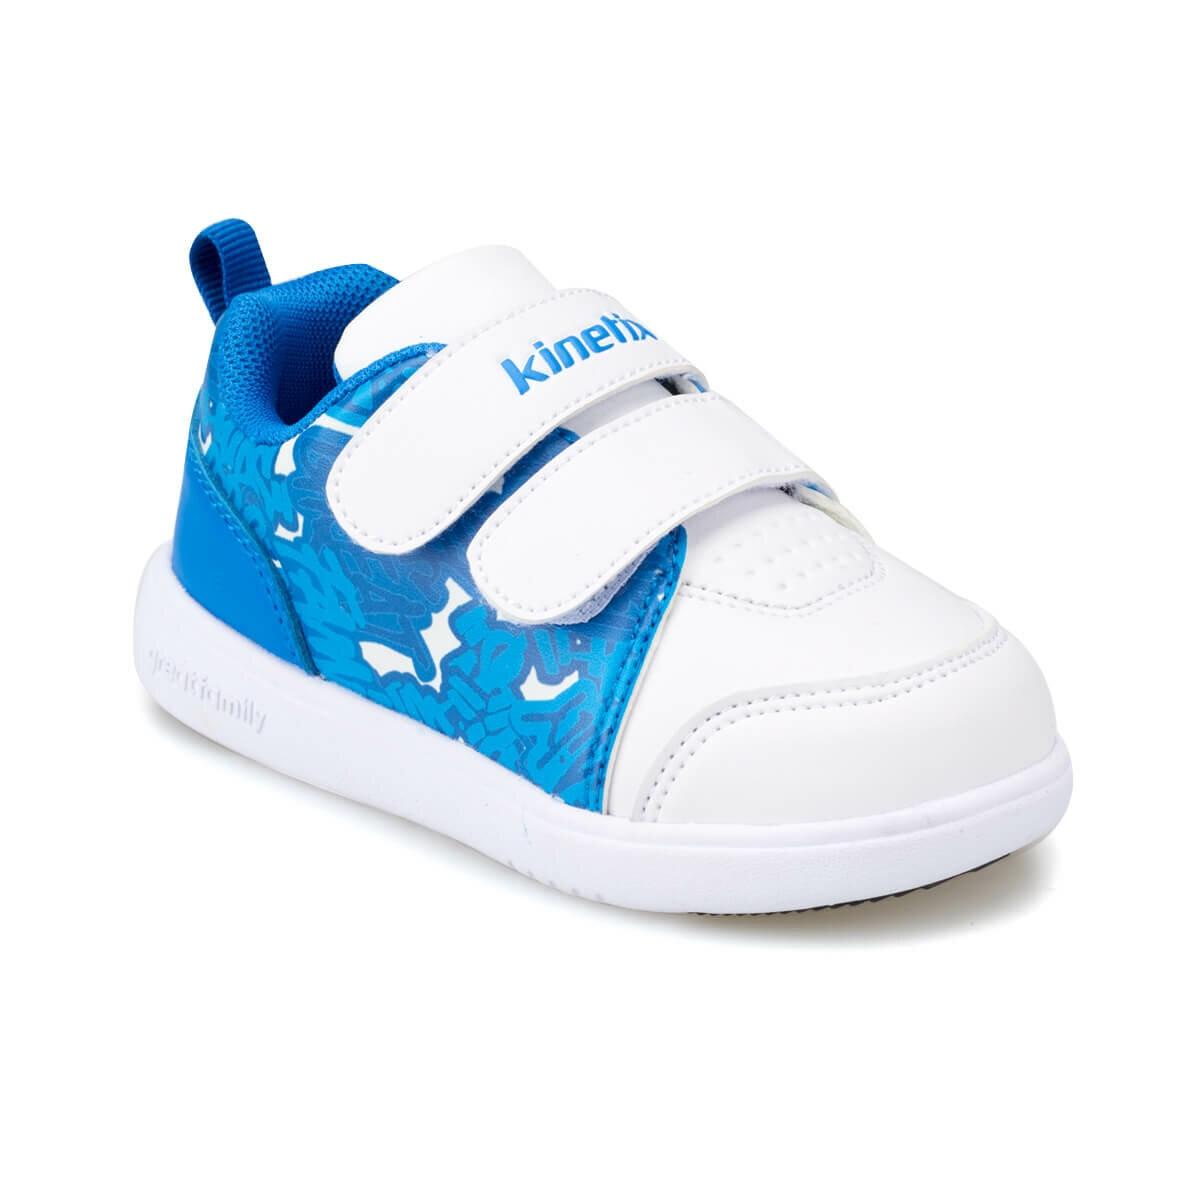 FLO BUNTA Saks Male Child Sneaker Shoes KINETIX